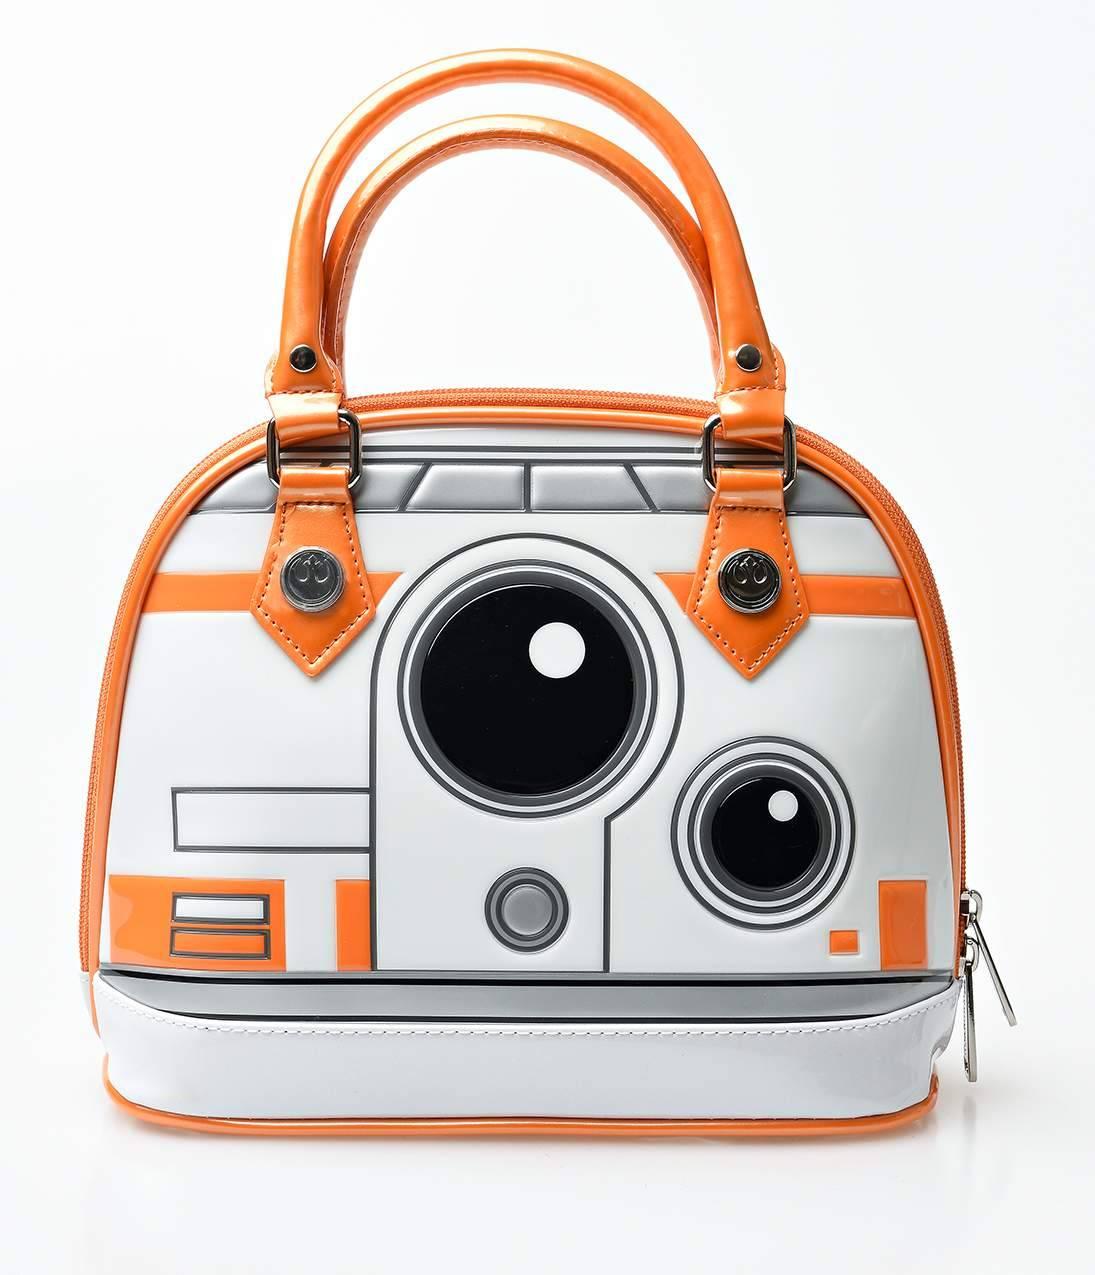 Orange_Patent_Star_Wars_The_Force_Awakens_BB-8_Dome_Bag_.jpg